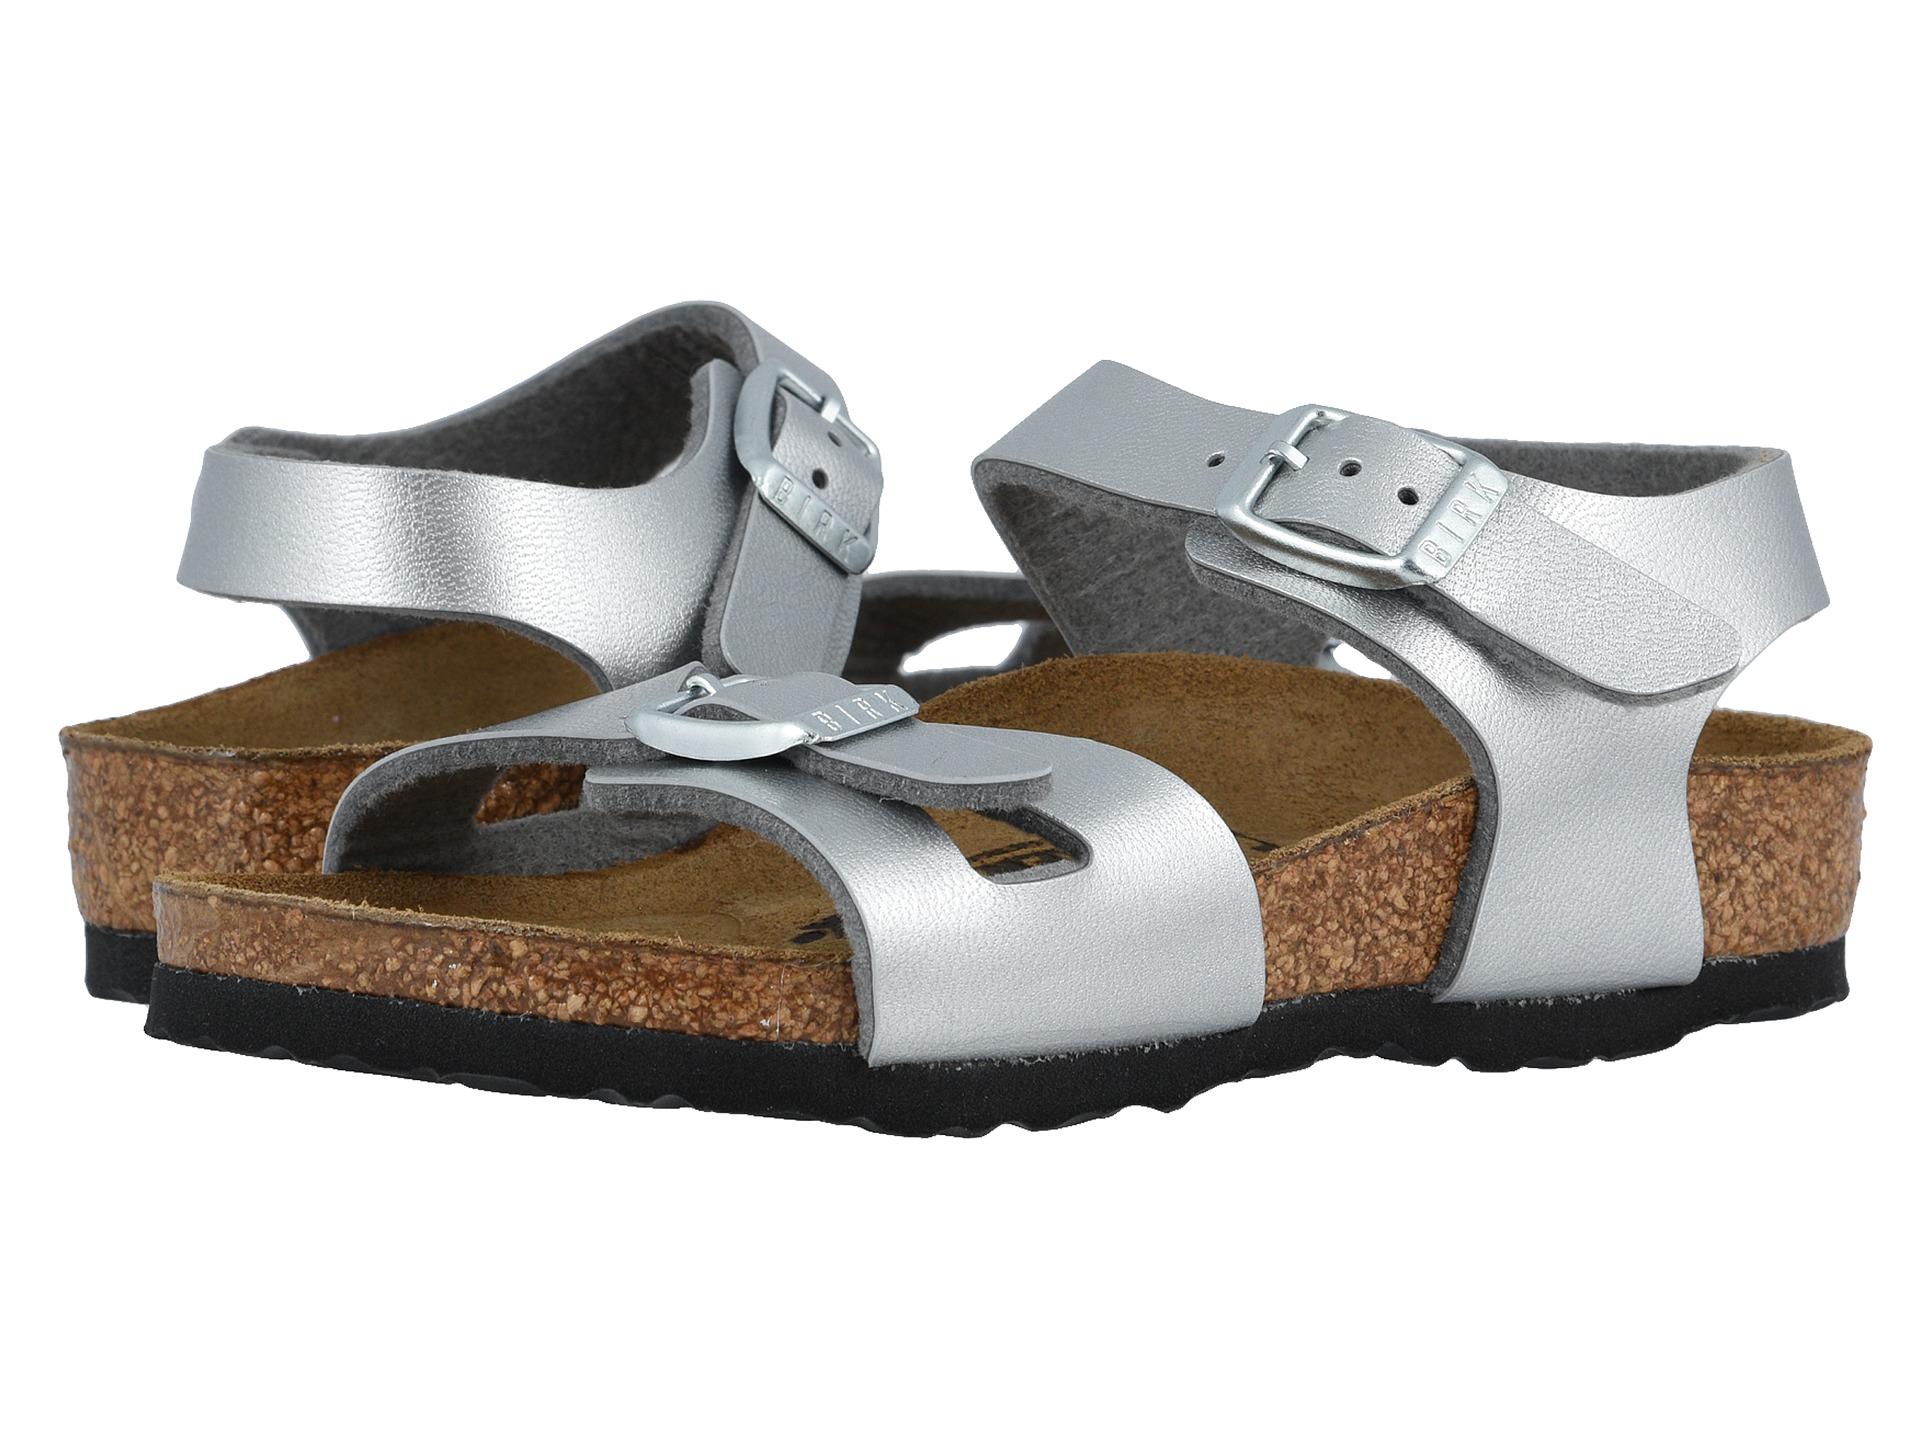 Kids Narrow Width Shoes